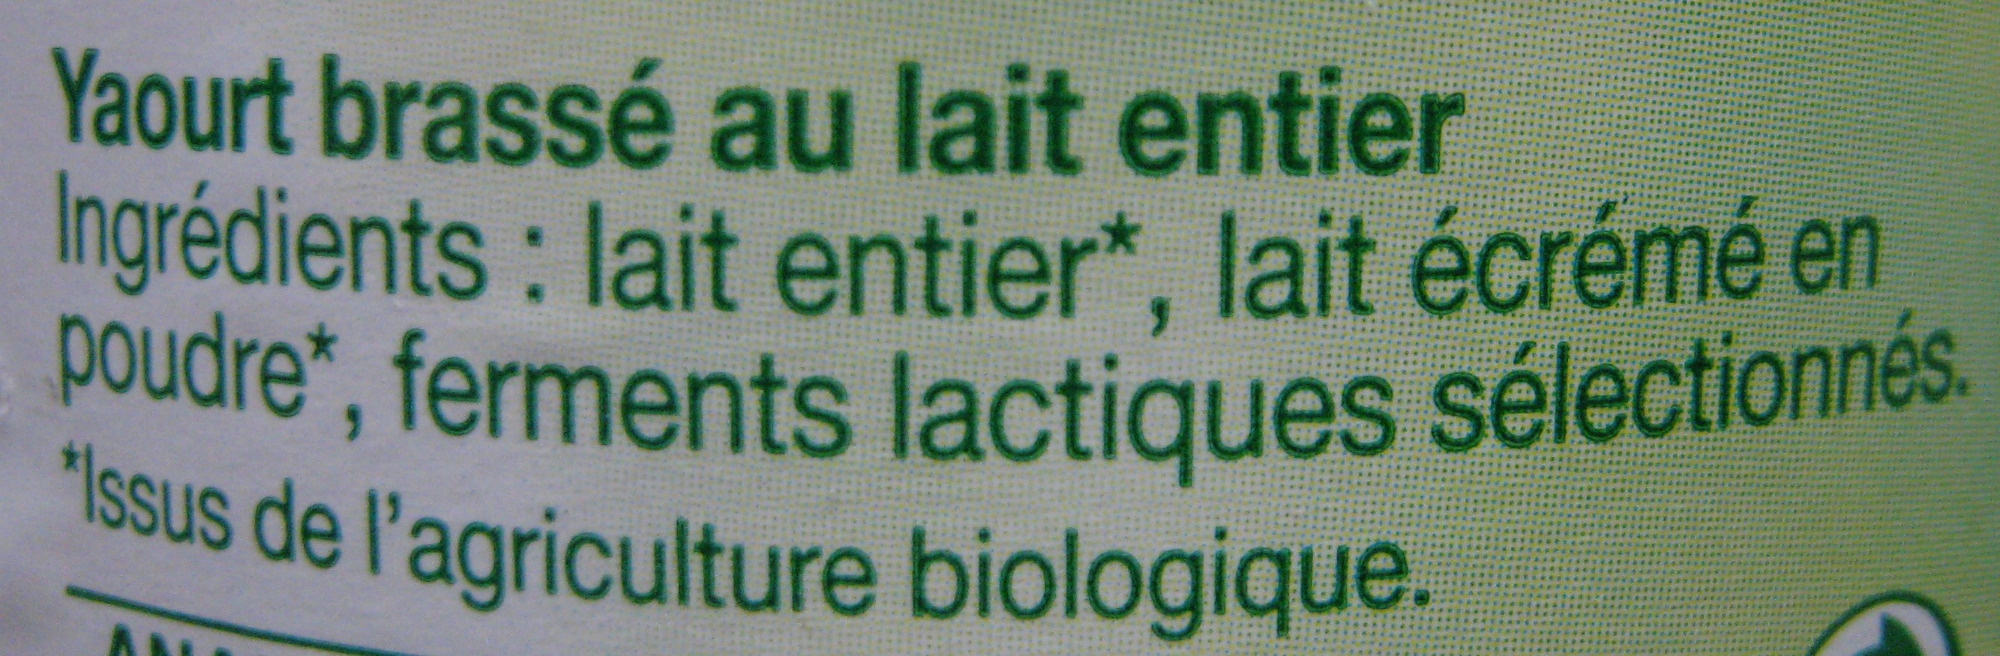 Yaourt brassé nature Bio - Ingredients - fr